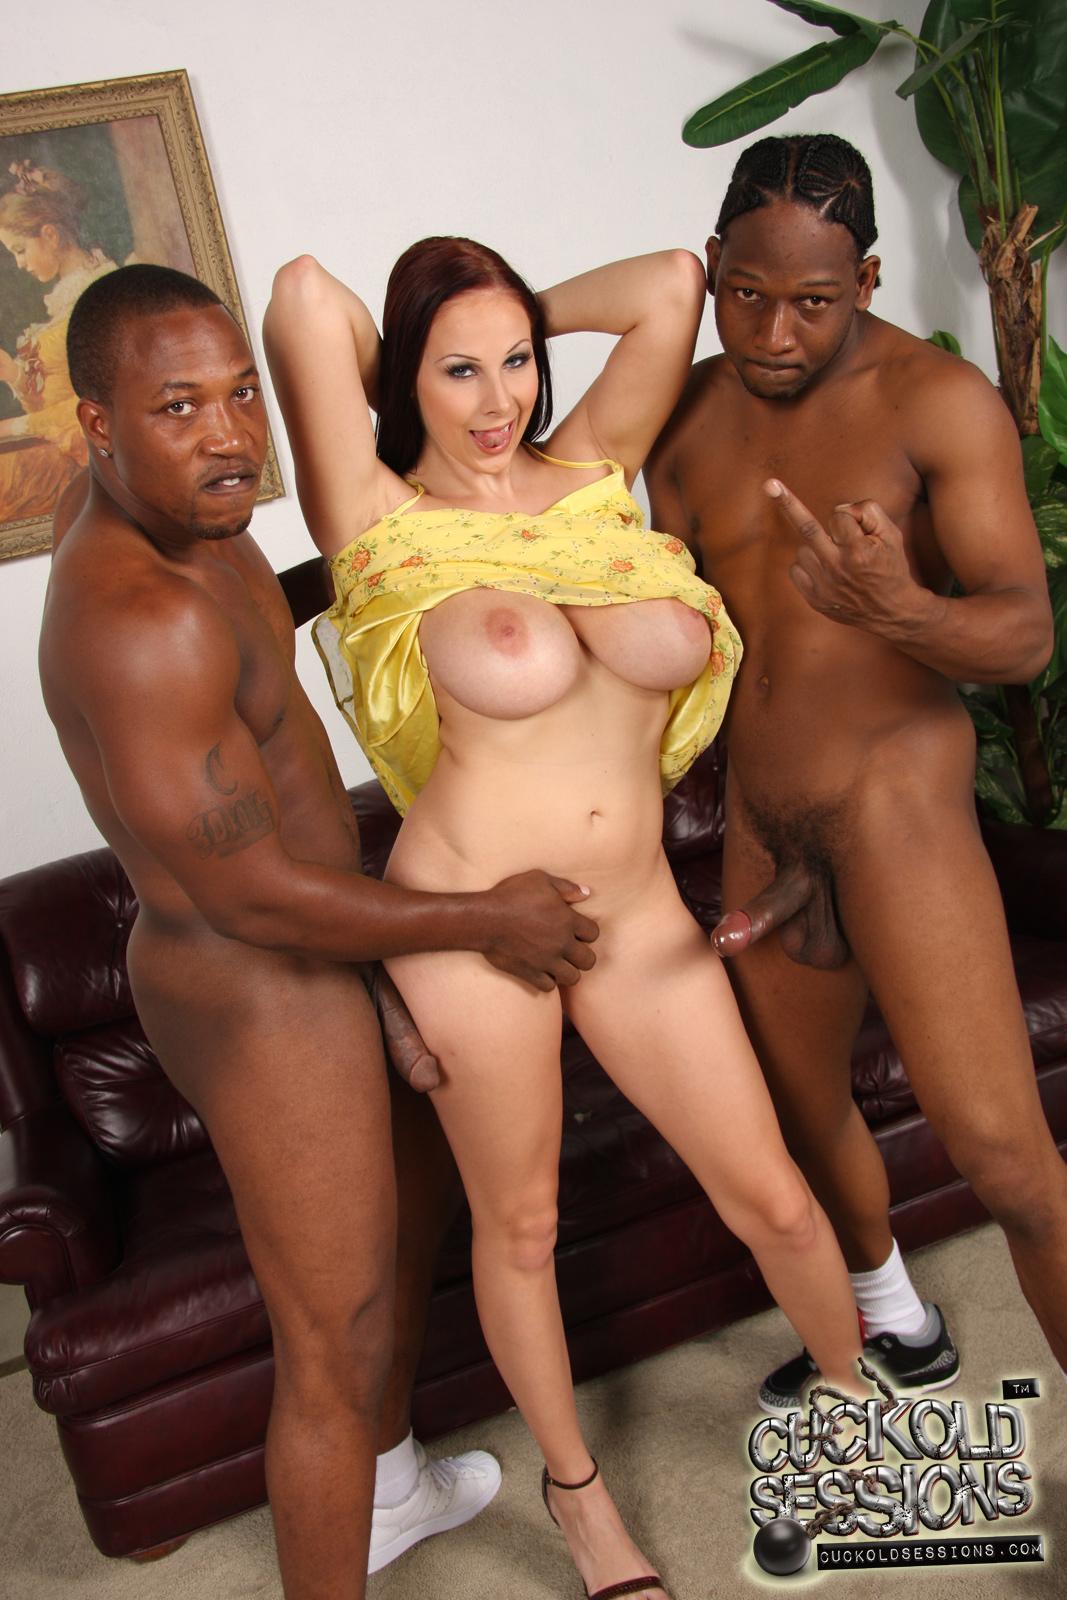 Missy erotic stories